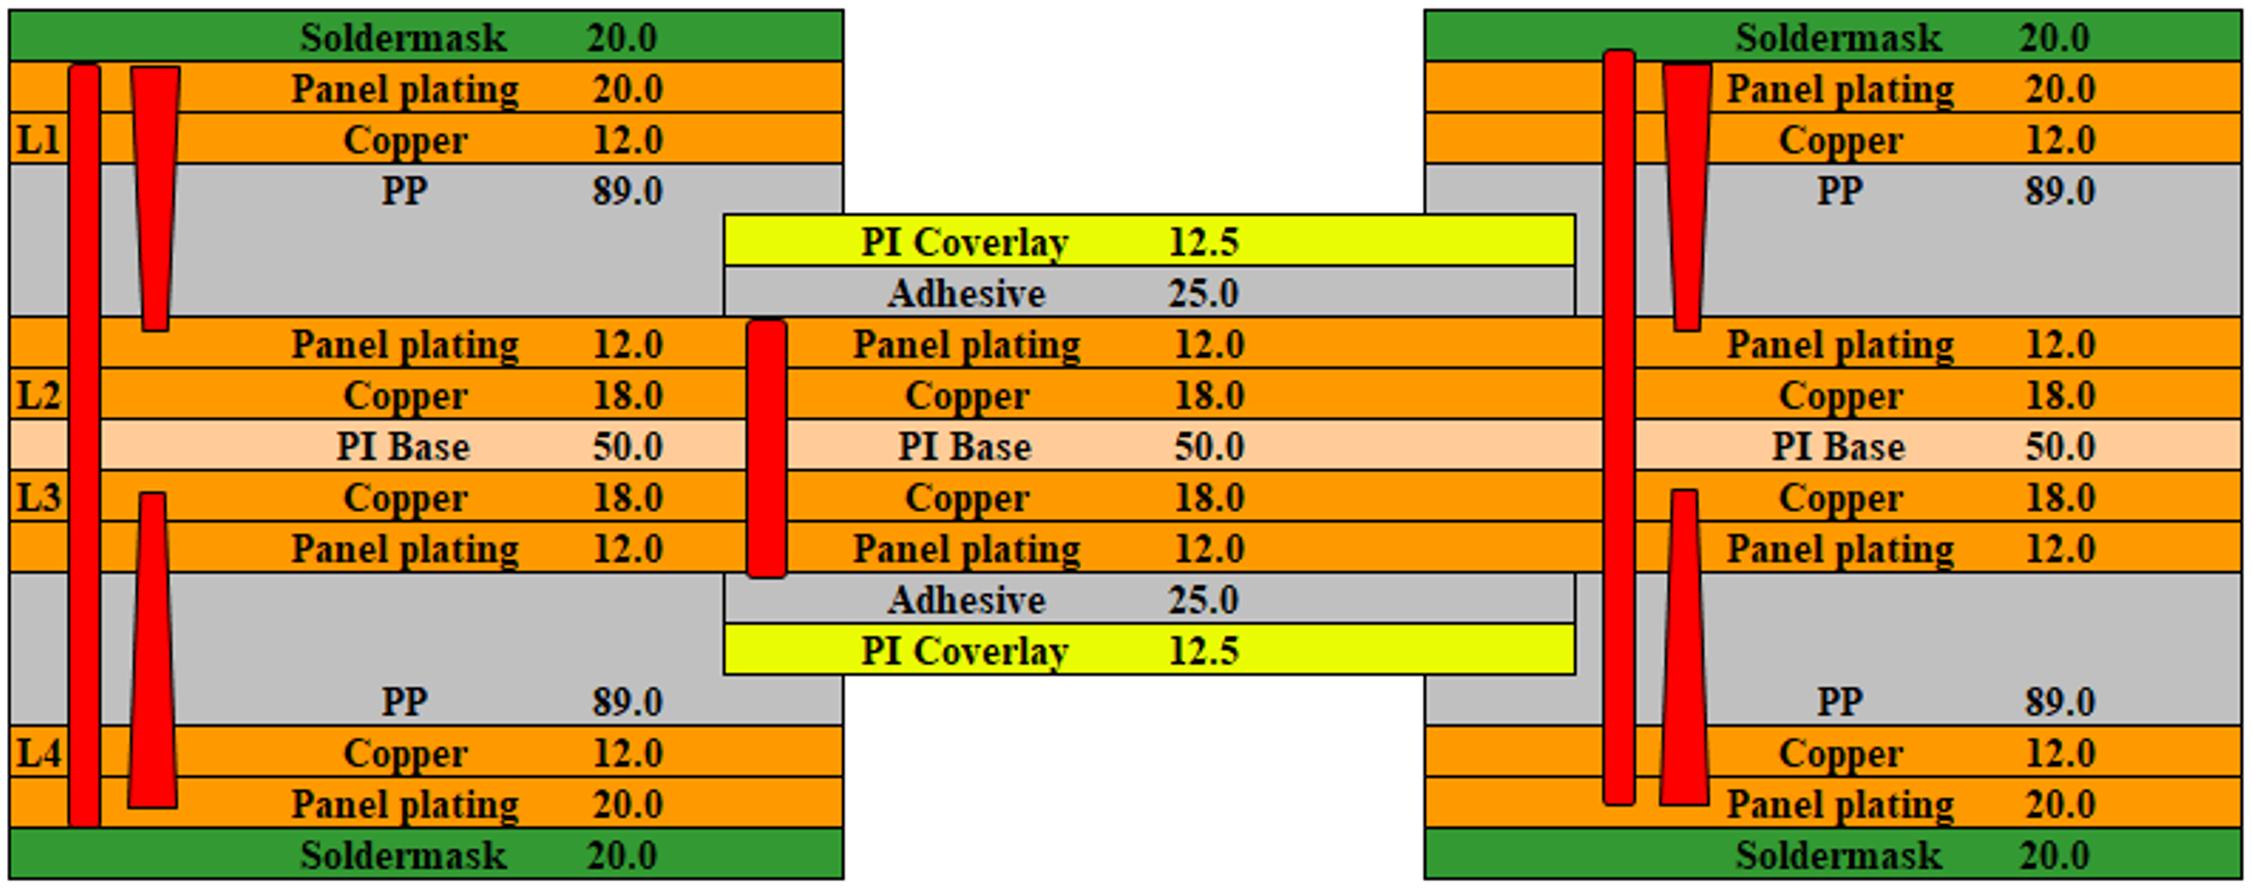 14 Lamination structure rigid flex PCB - 4L rigid flex board for medical helmet